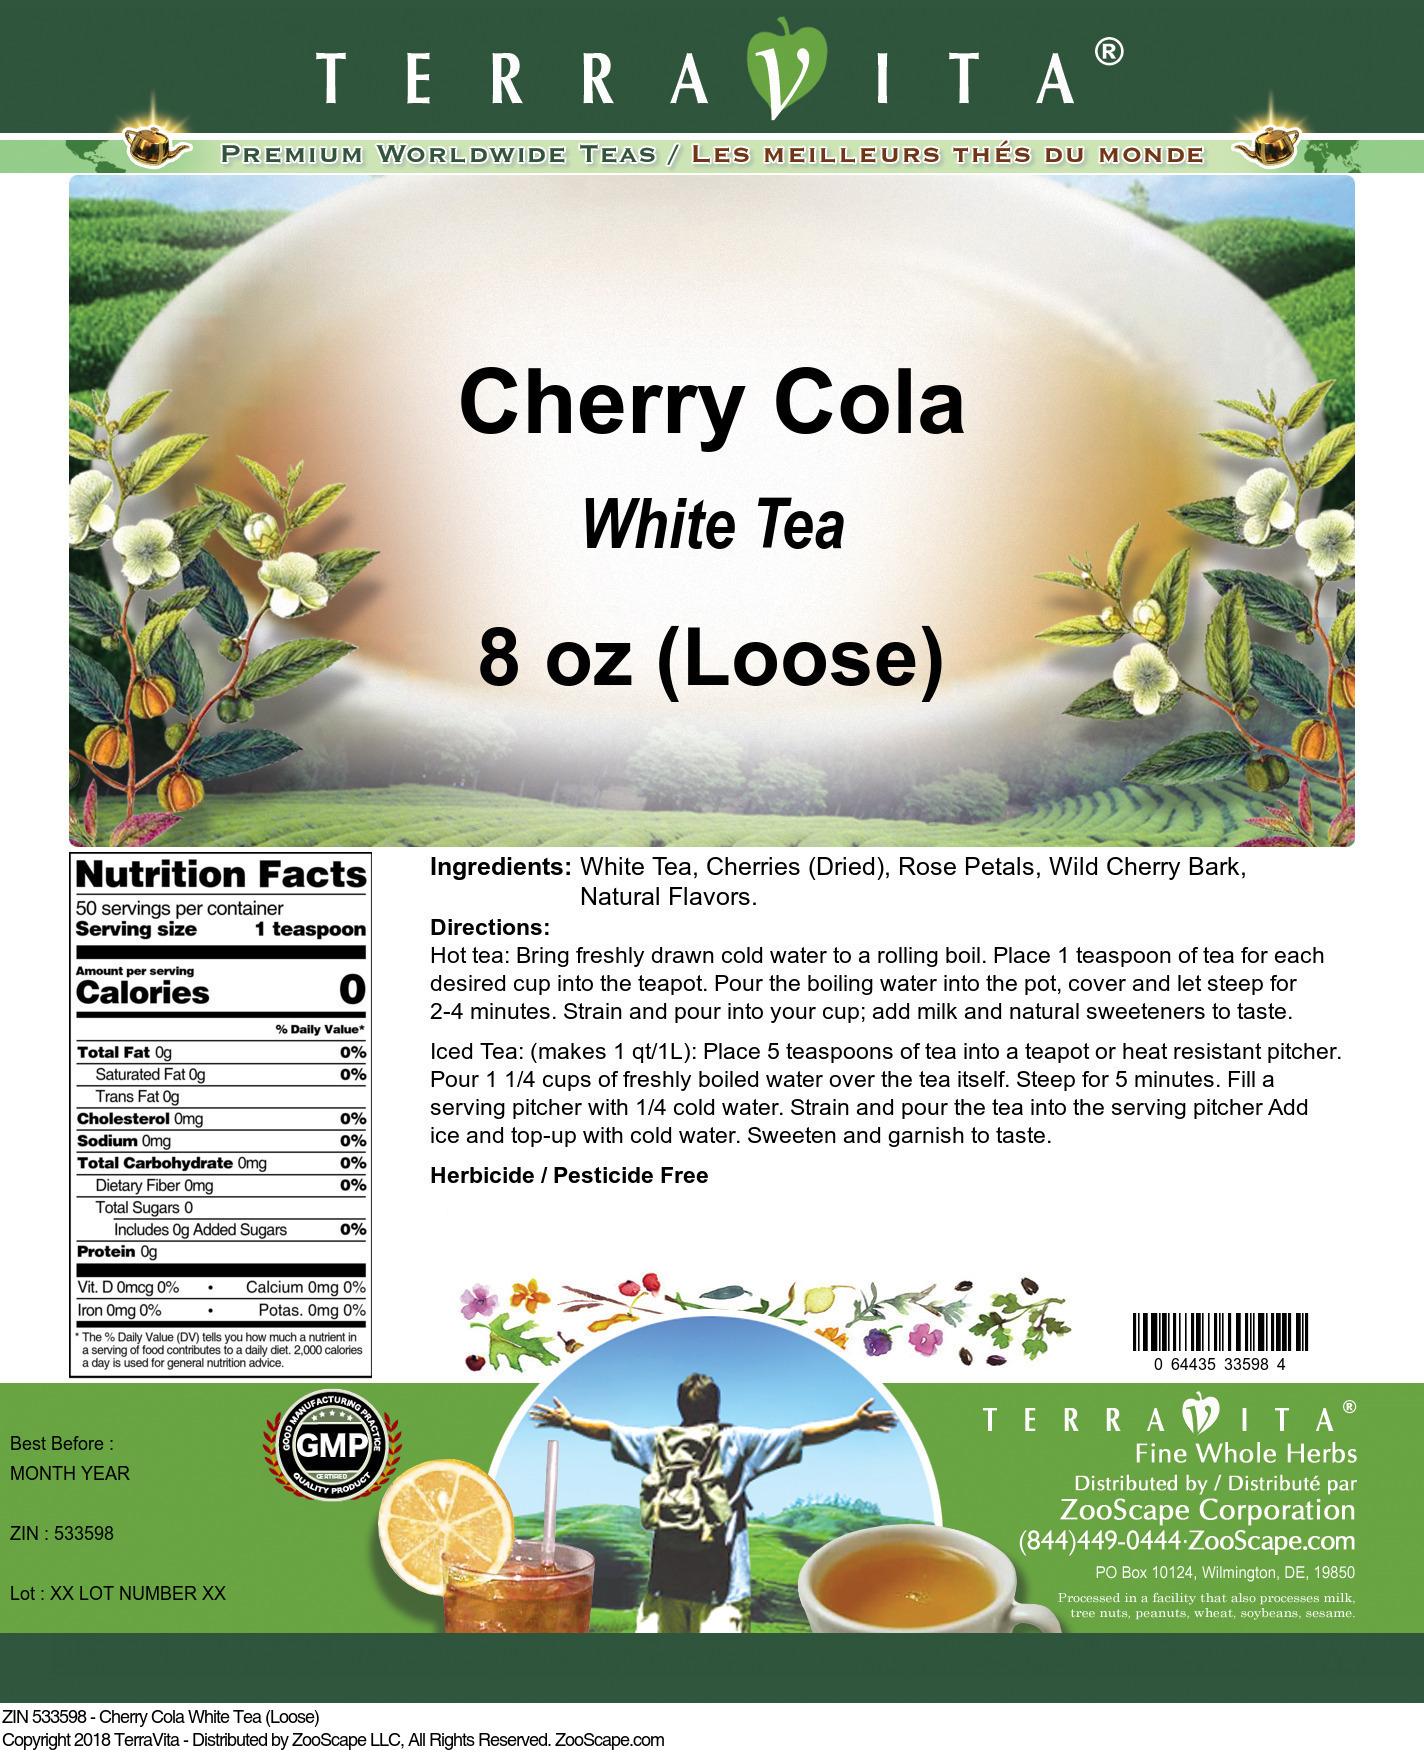 Cherry Cola White Tea (Loose)